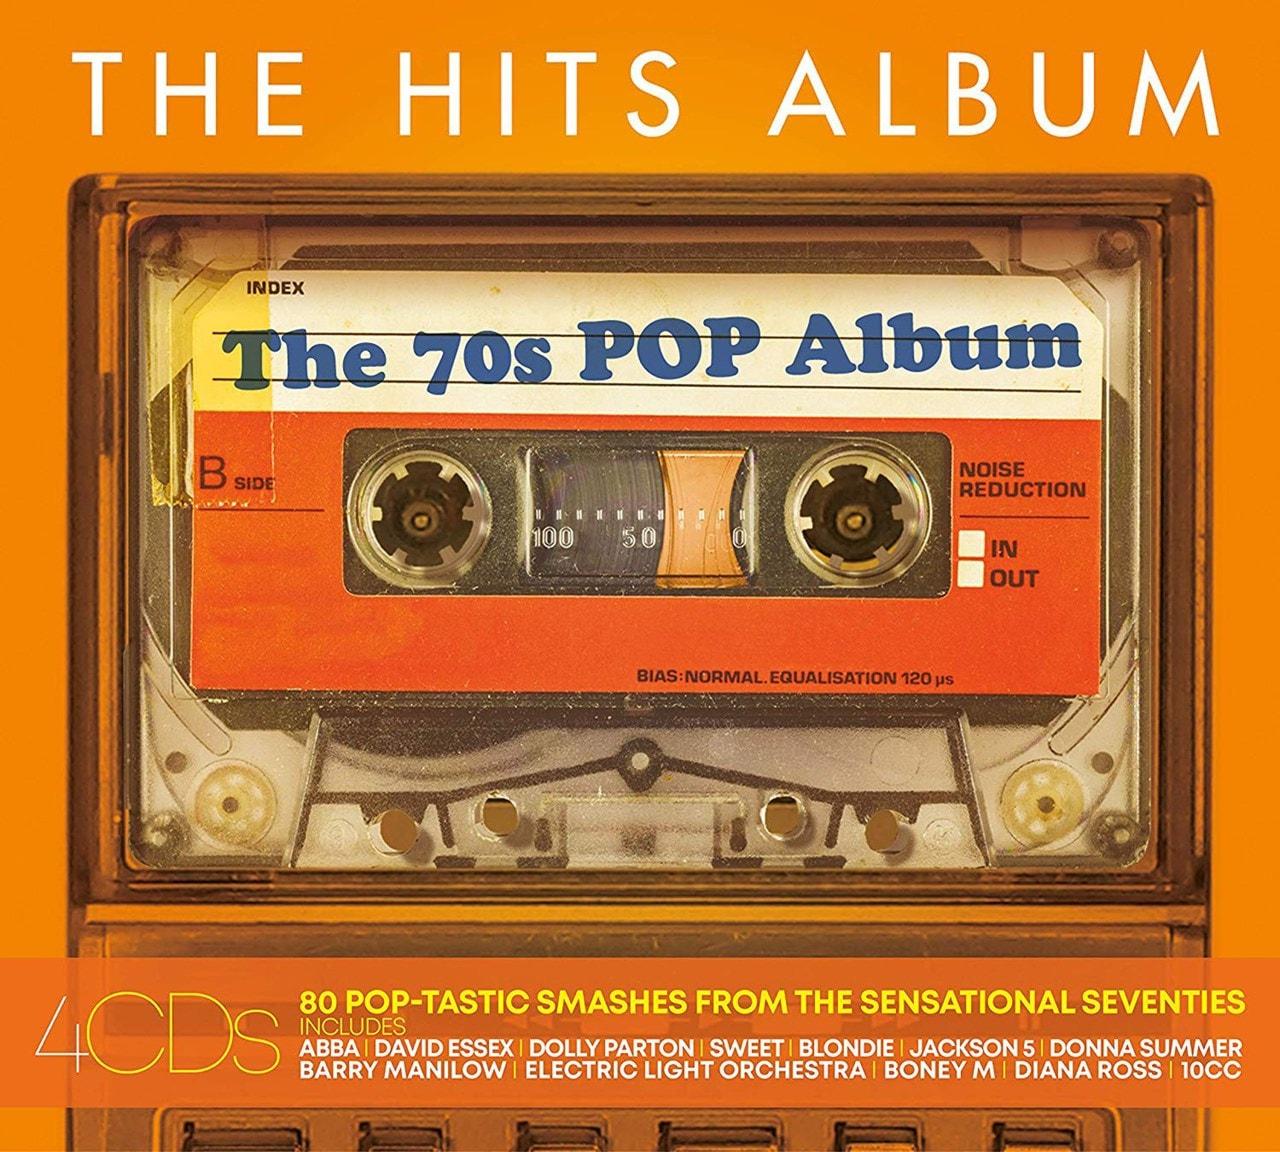 The Hits Album: The 70s Pop Album - 1